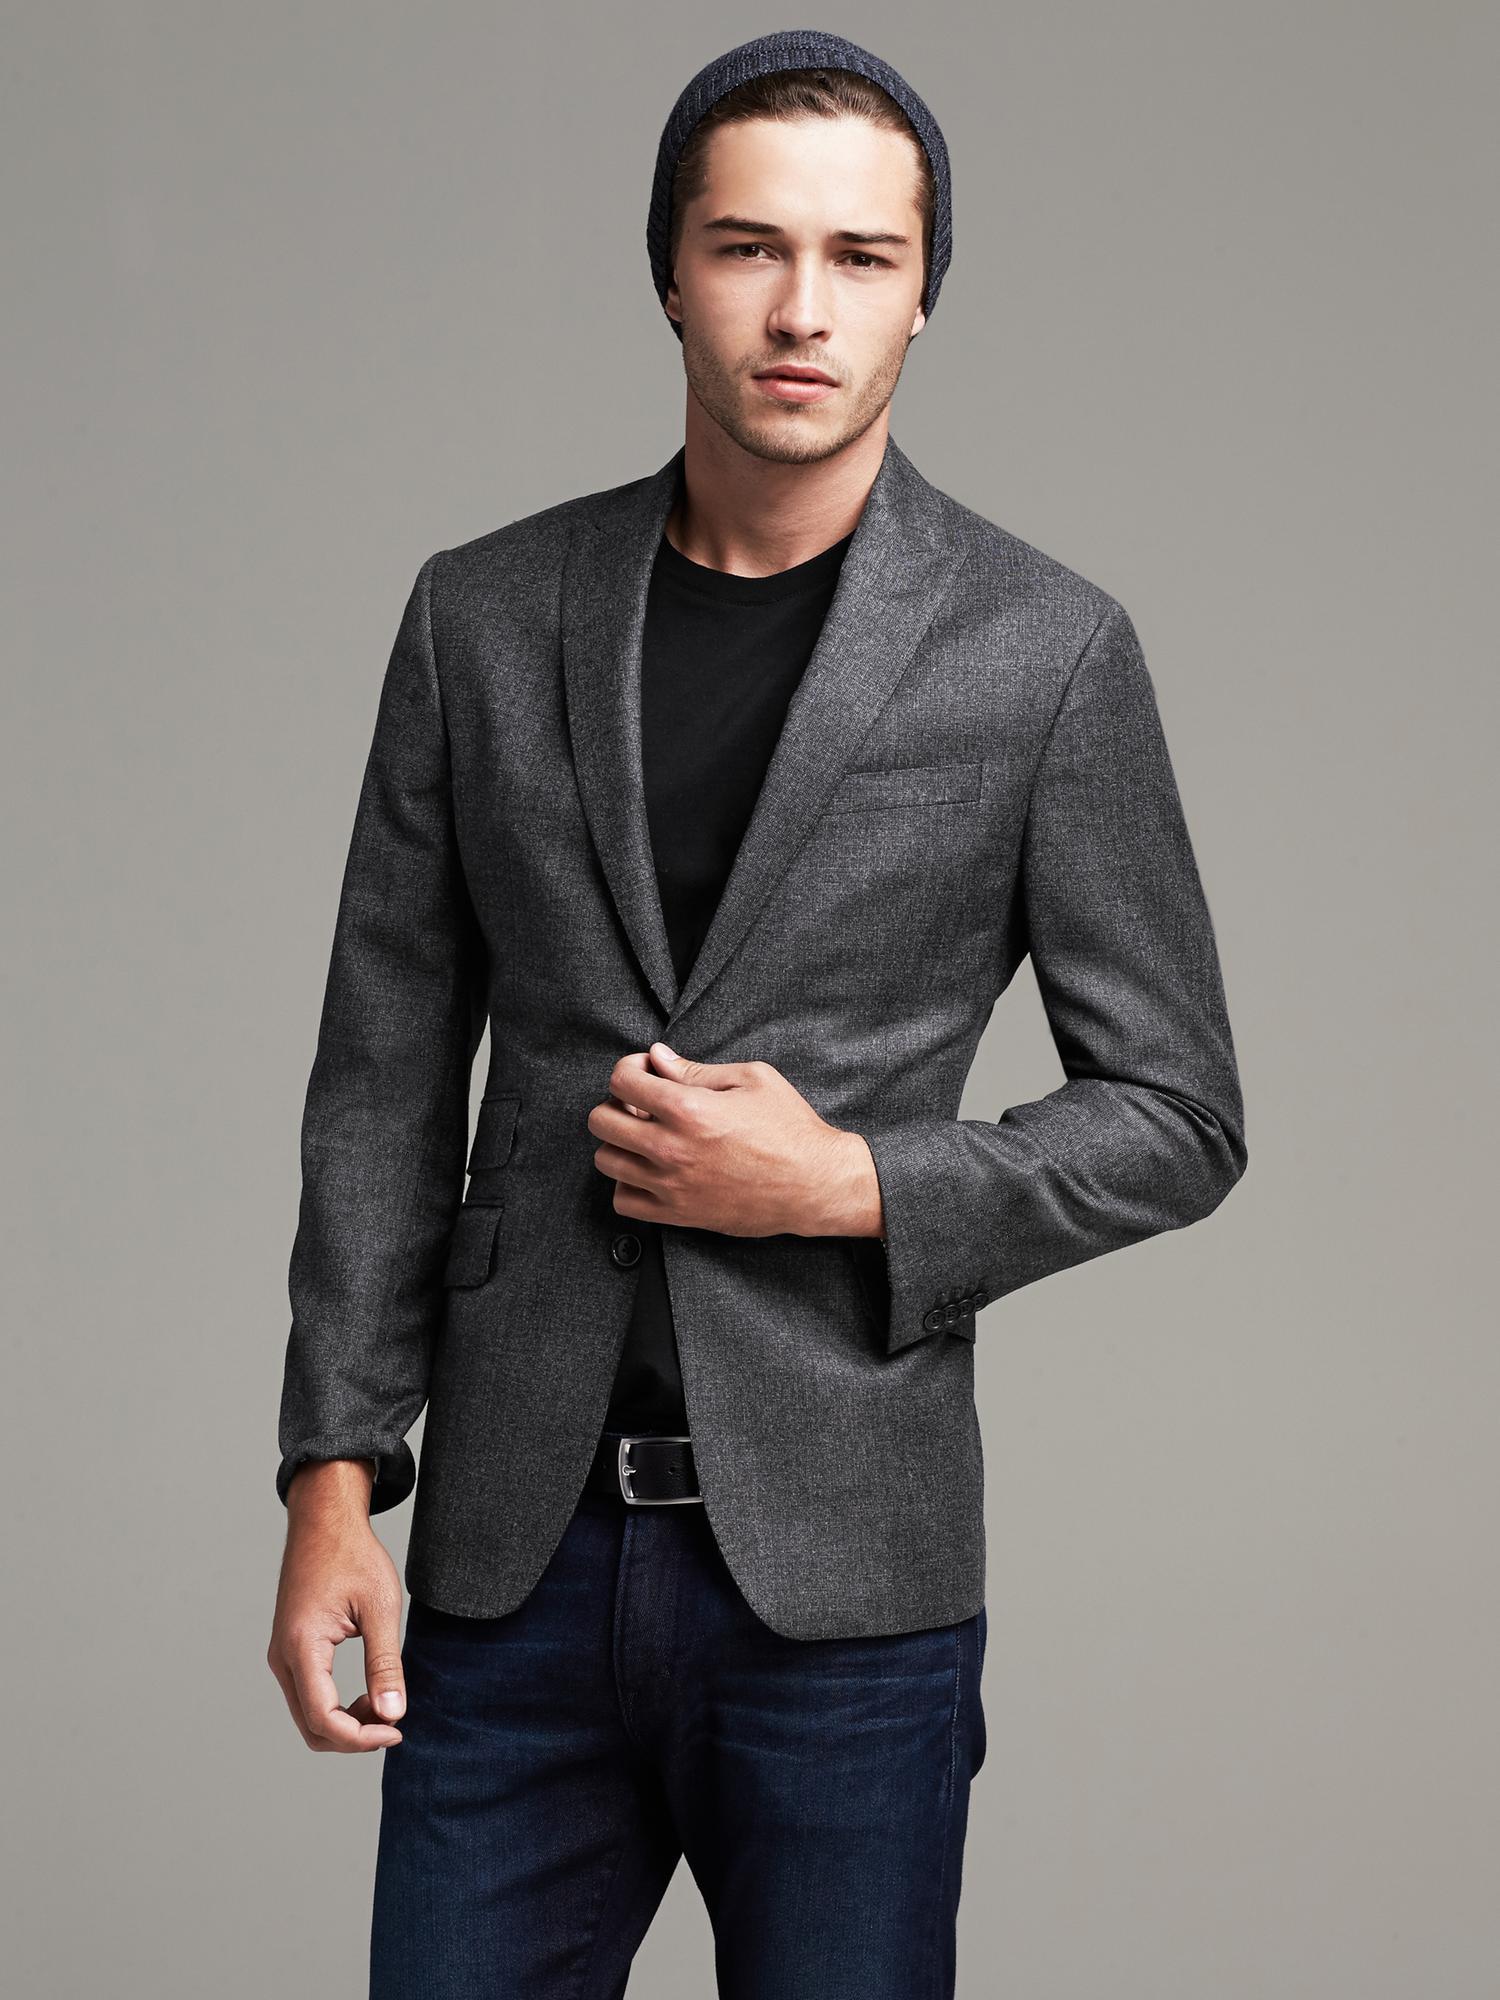 1381b350c2c4 Lyst - Banana Republic Modern Slim-fit Charcoal Wool Suit Jacket in ...